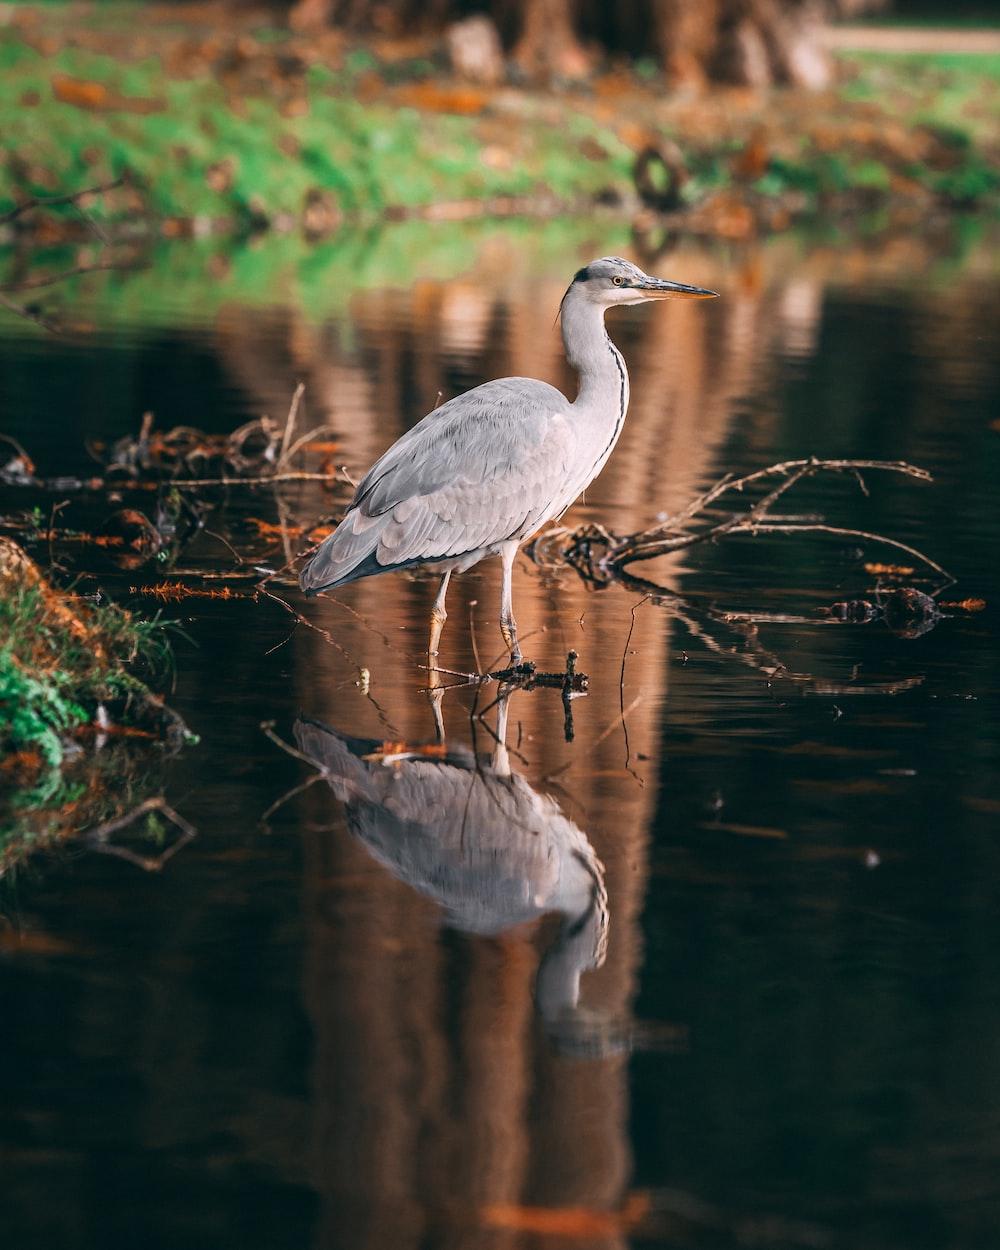 Bird  | HD photo by Christopher Rusev (@ralics) on Unsplash